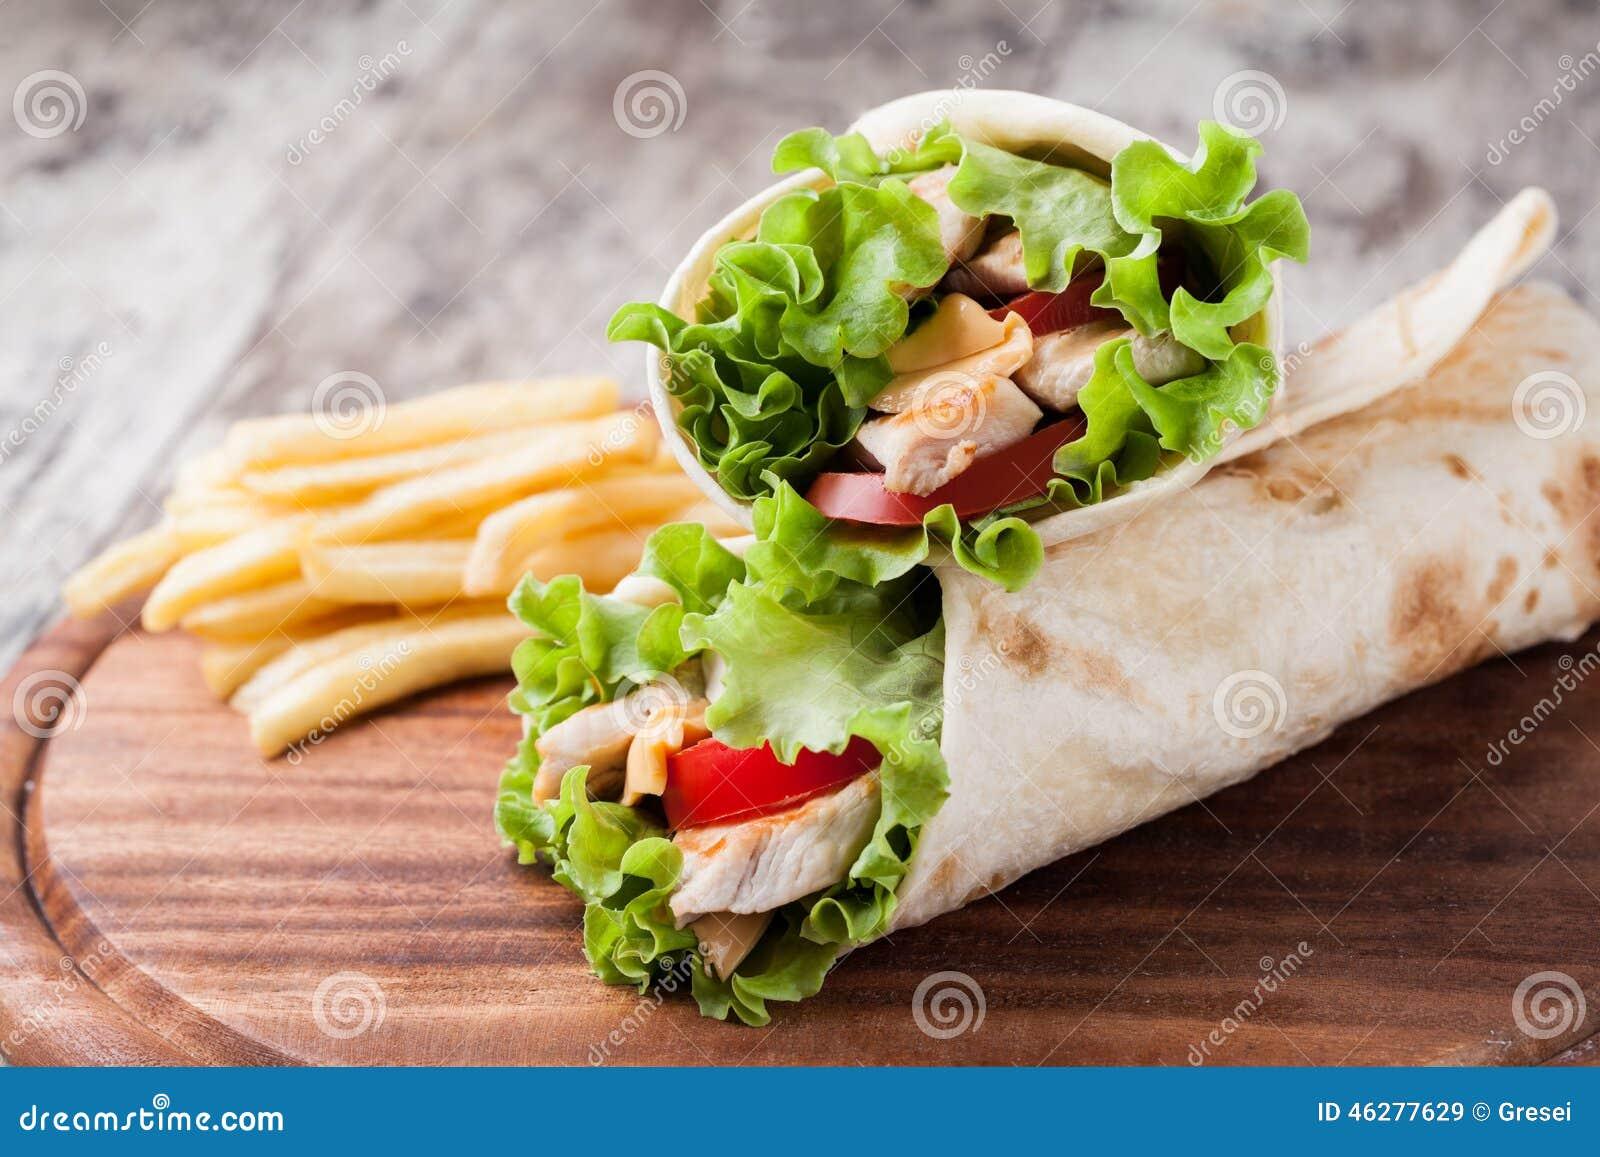 Tortilla Wrap, Fajita Stock Photo - Image: 46277629